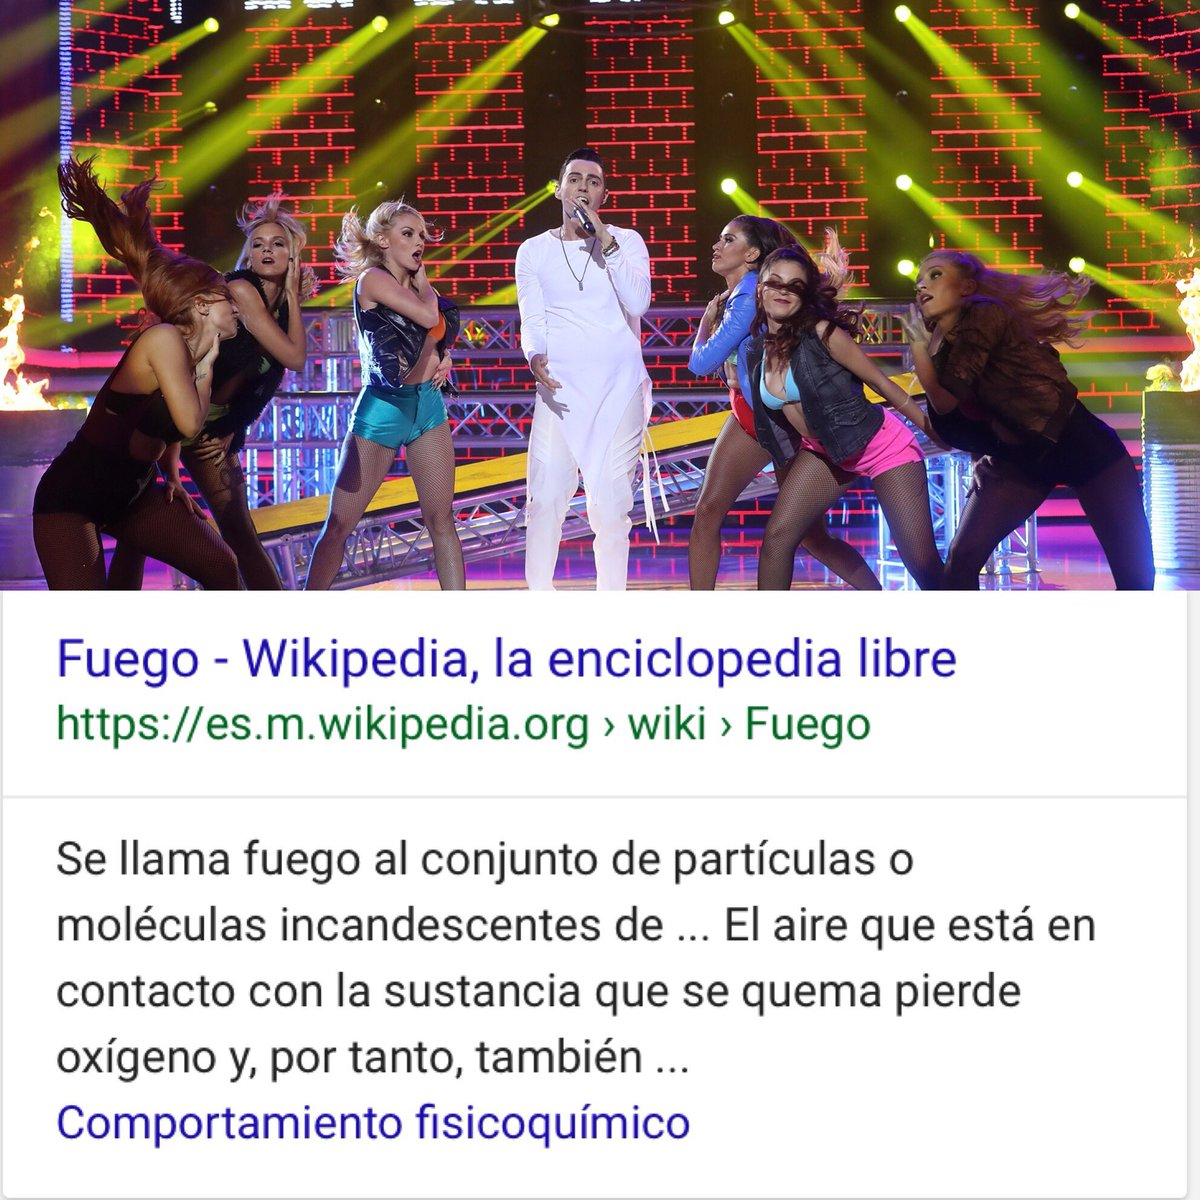 BOUM!! No lo digo yo, lo dice la Wikipedia!  #TCMS #malditoFuego #heclavadoLosCatchs #Flow #NuncademasiadoPickyPicky https://t.co/IYbN3dc9PA